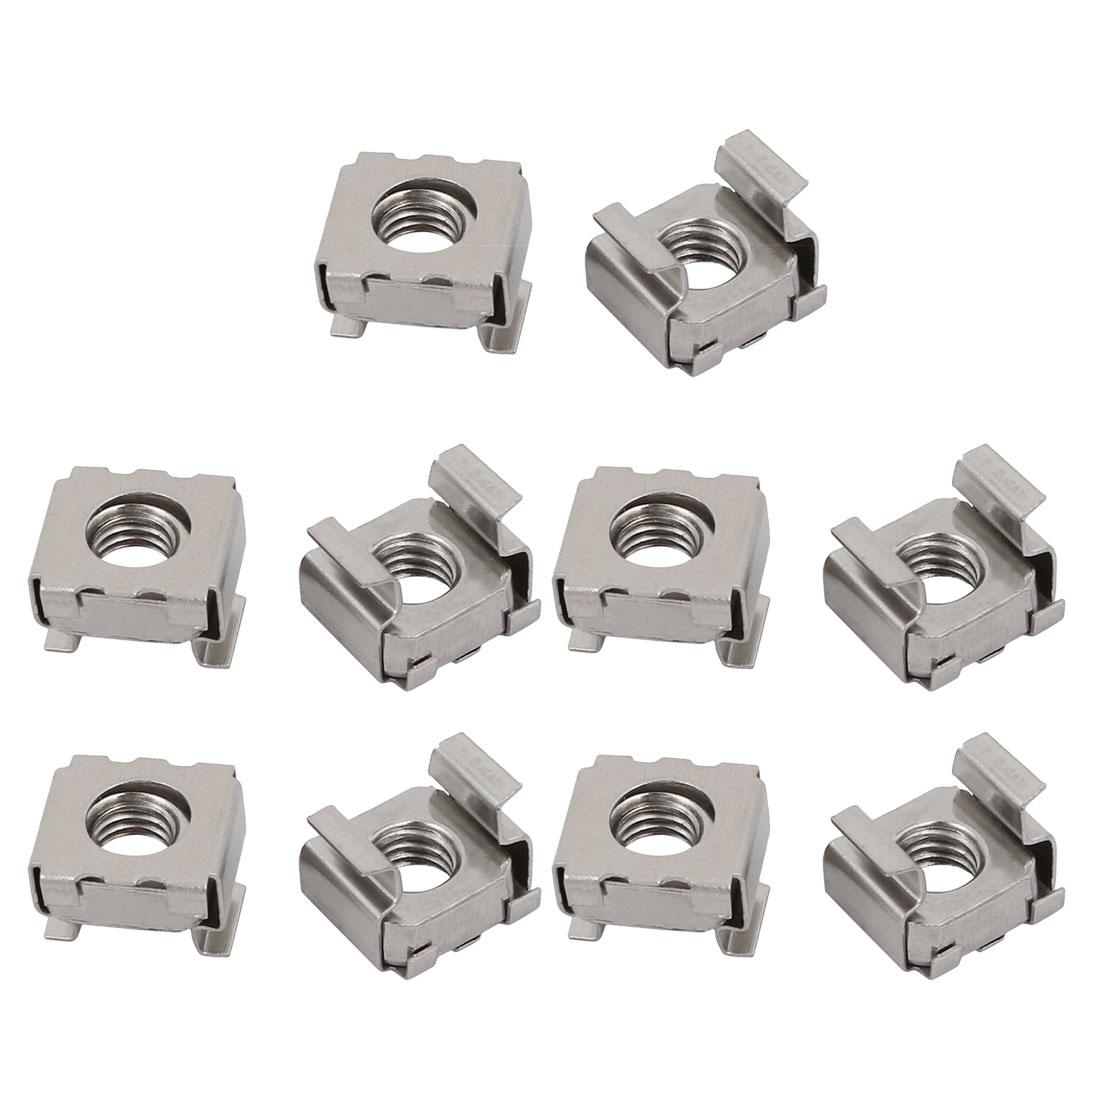 10pcs M6 304 Stainless Steel Cage Nut for Server Shelves Shelf Cabinet